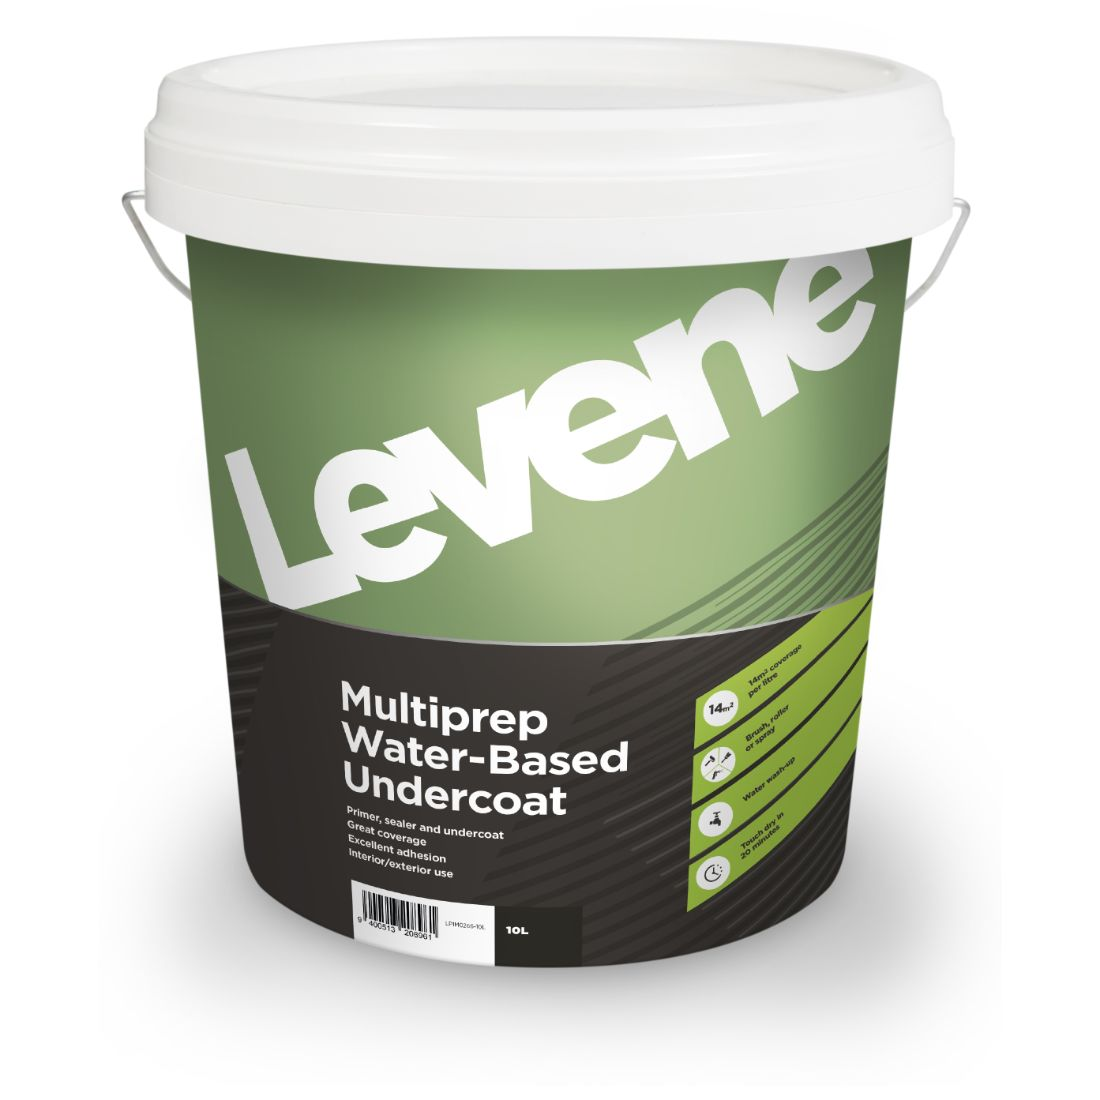 Multi Prep Water Based Undercoat 10L